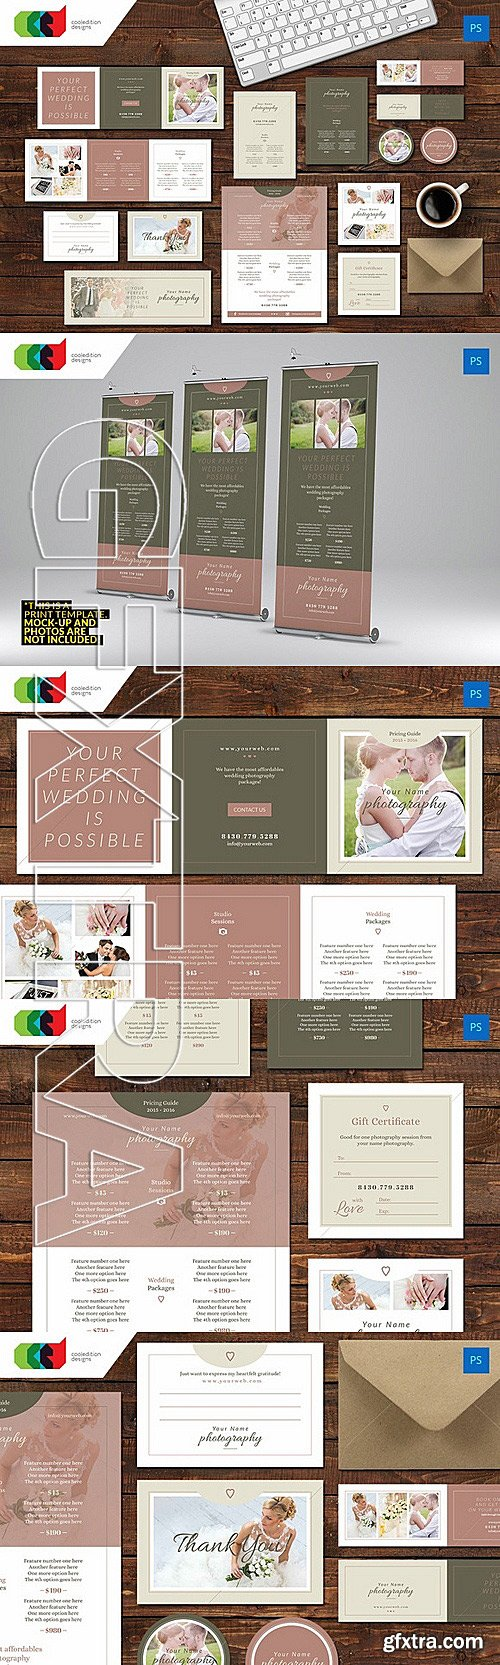 CM - Encanta - Photography Marketing Set 335903